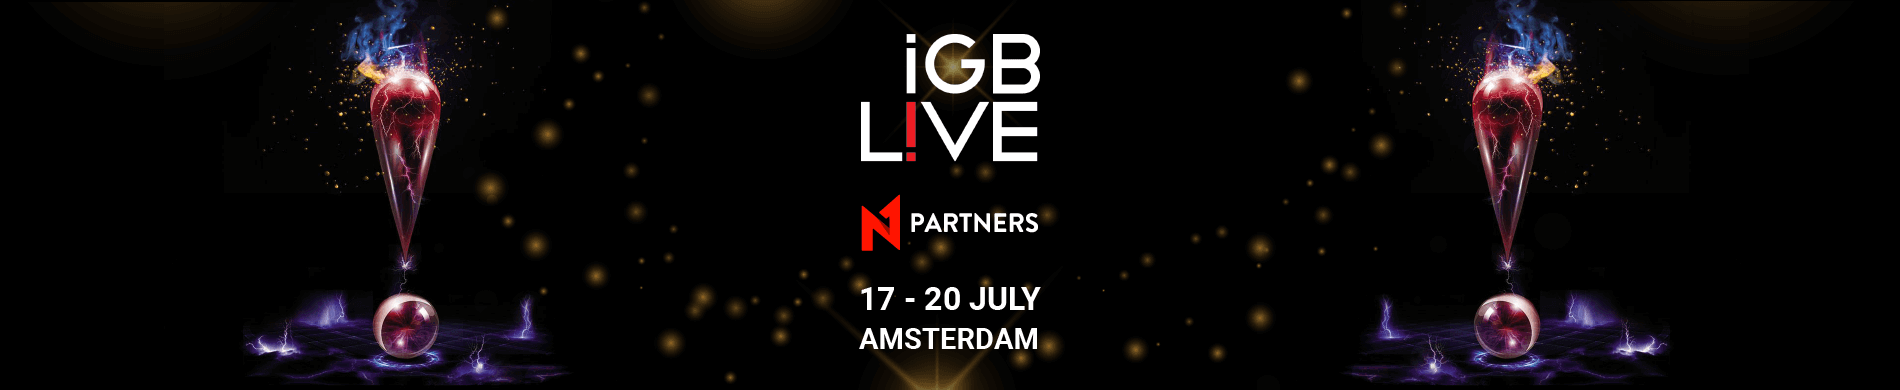 IGB LIVE 2019 N1 CaSino